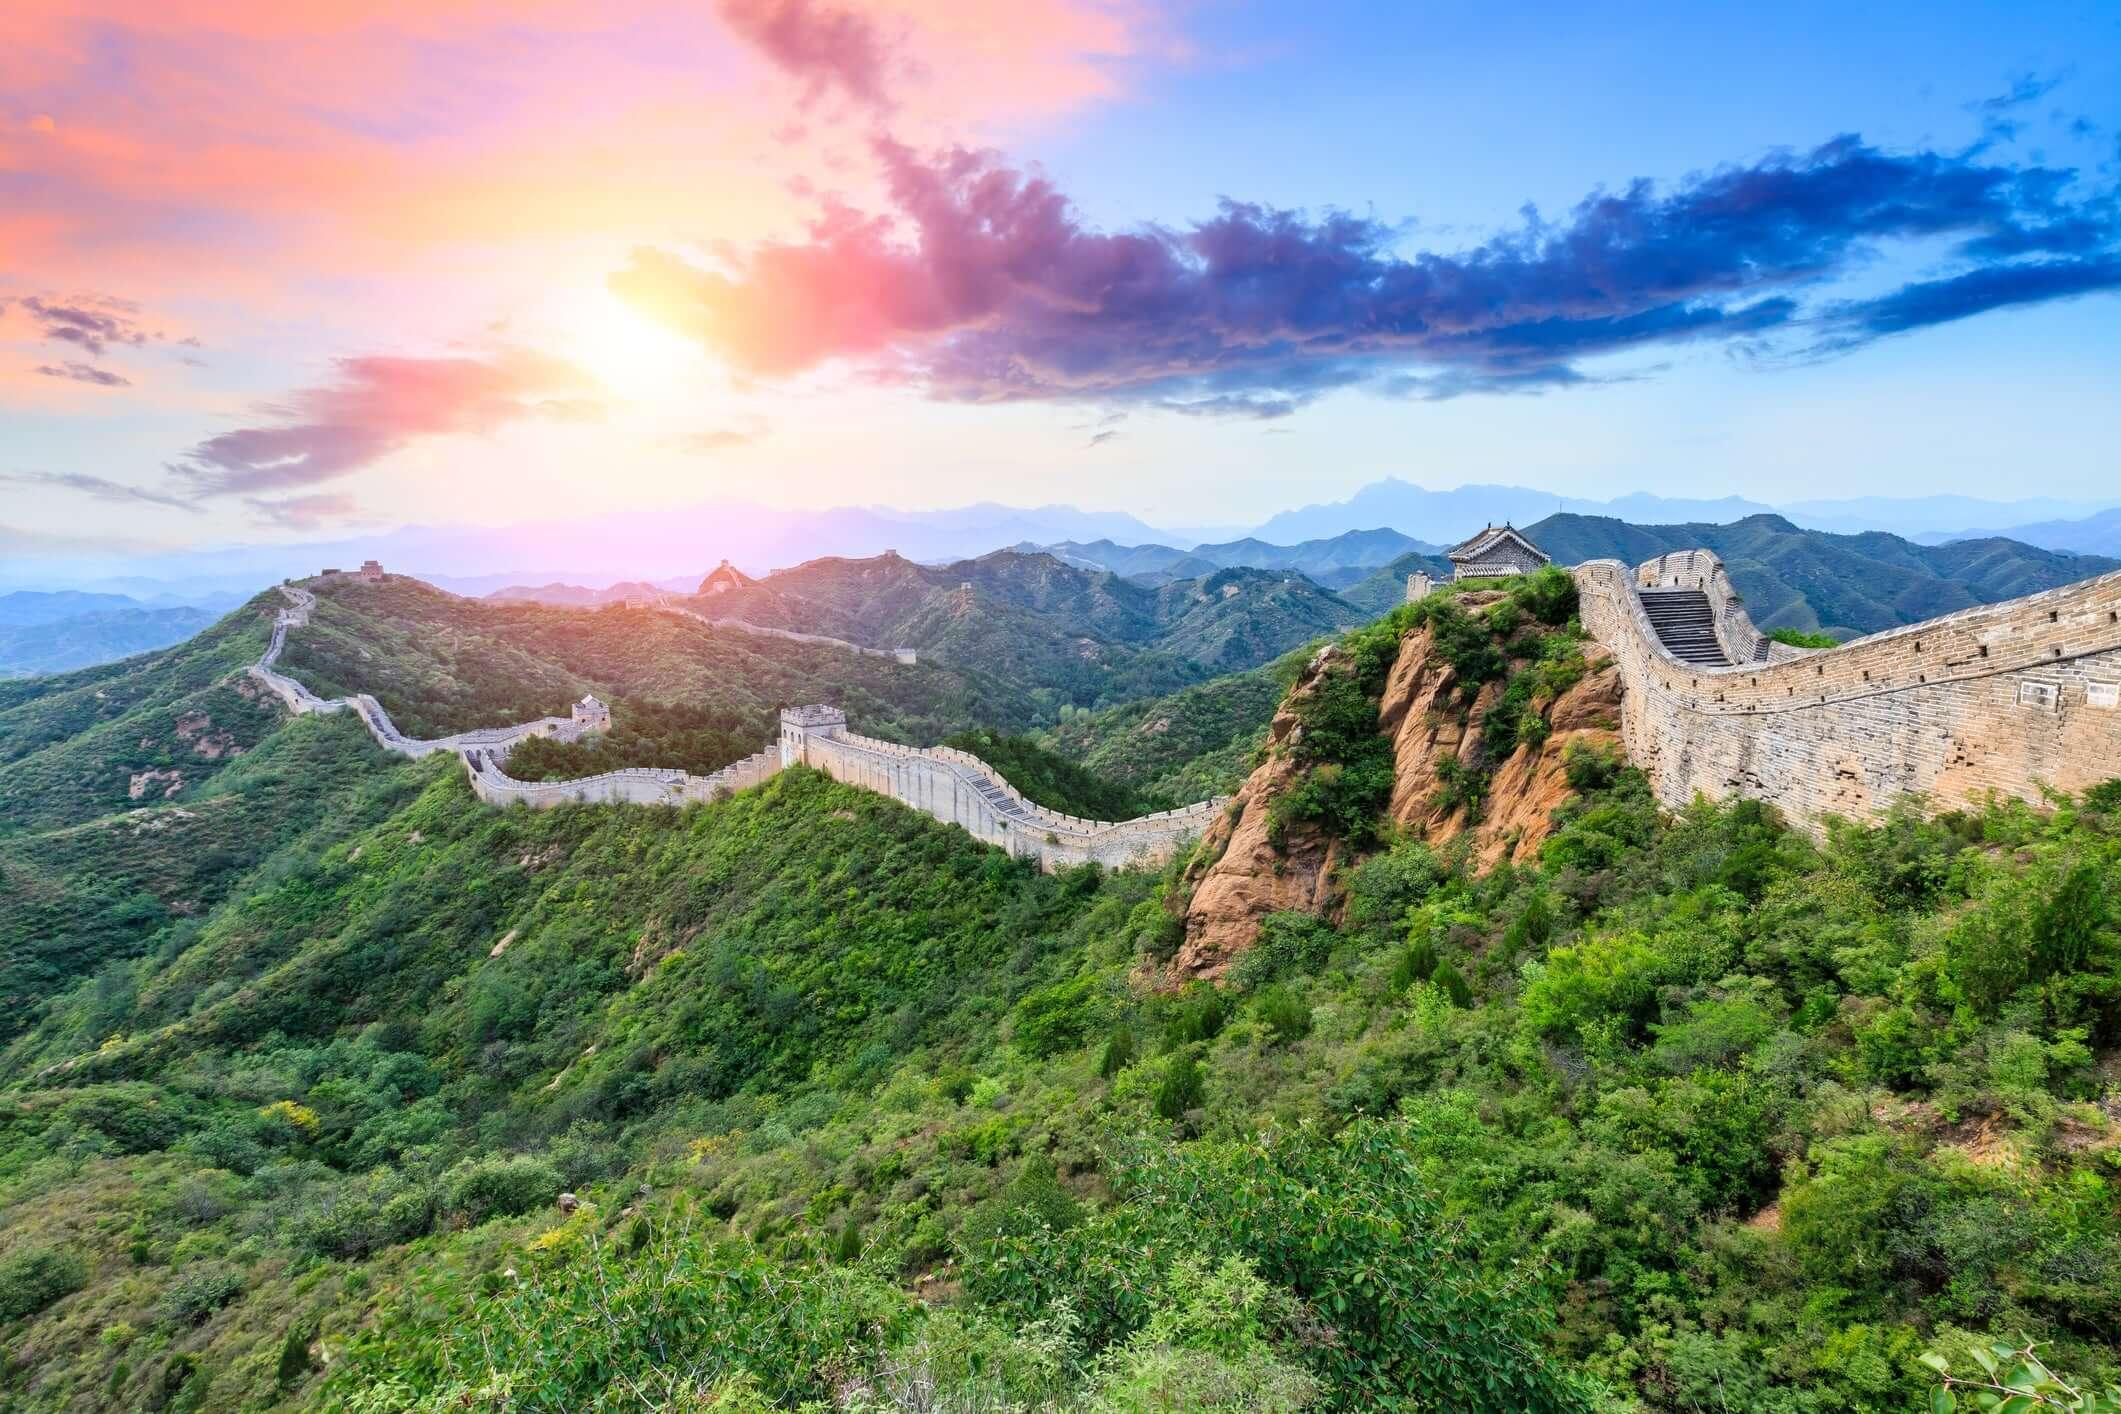 11 Curiozitati despre Marele Zid Chinezesc